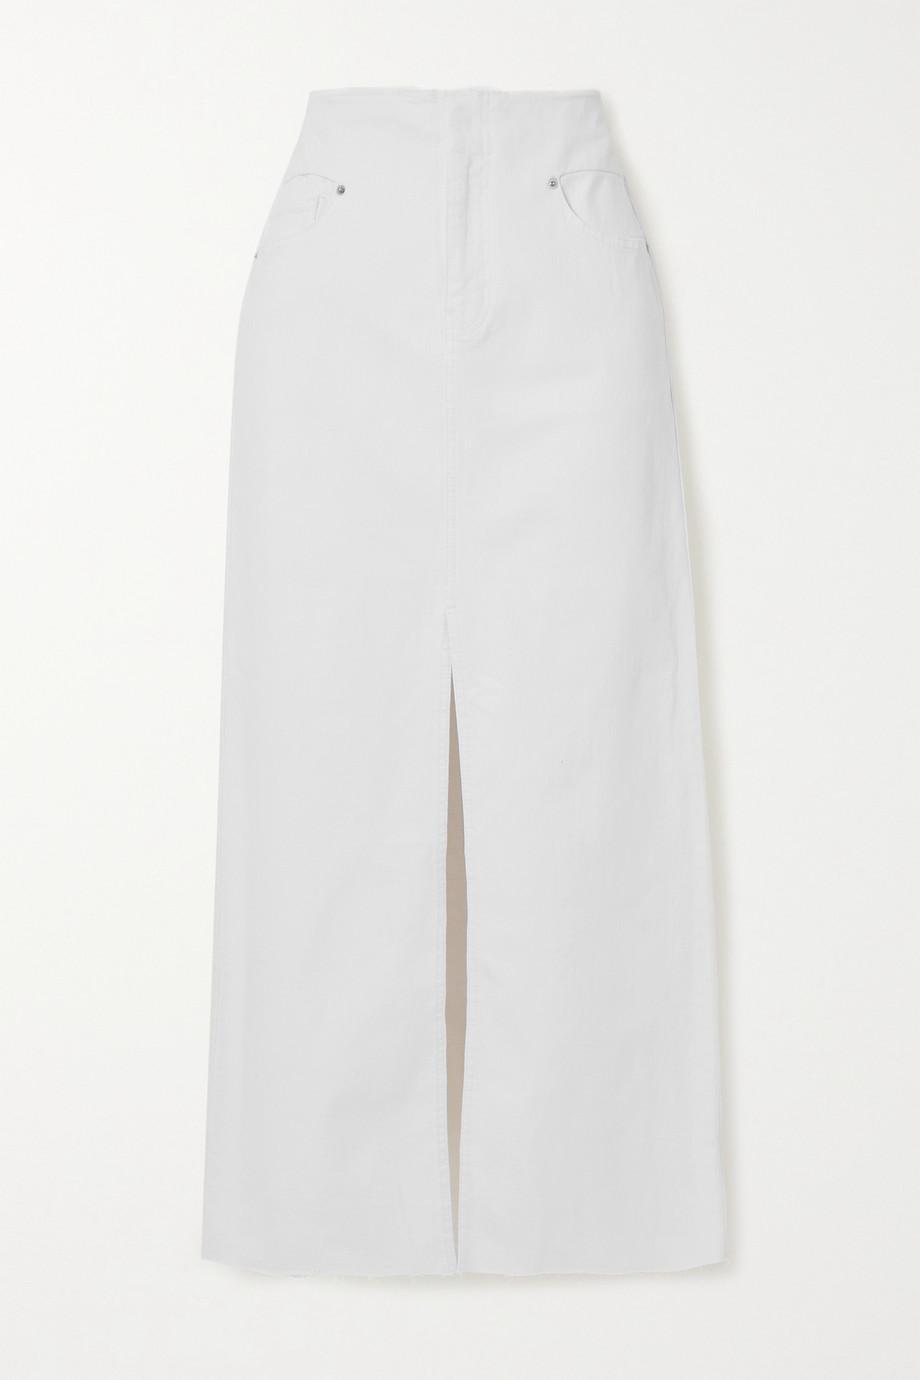 FRAME Jupe longue en jean stretch effilé